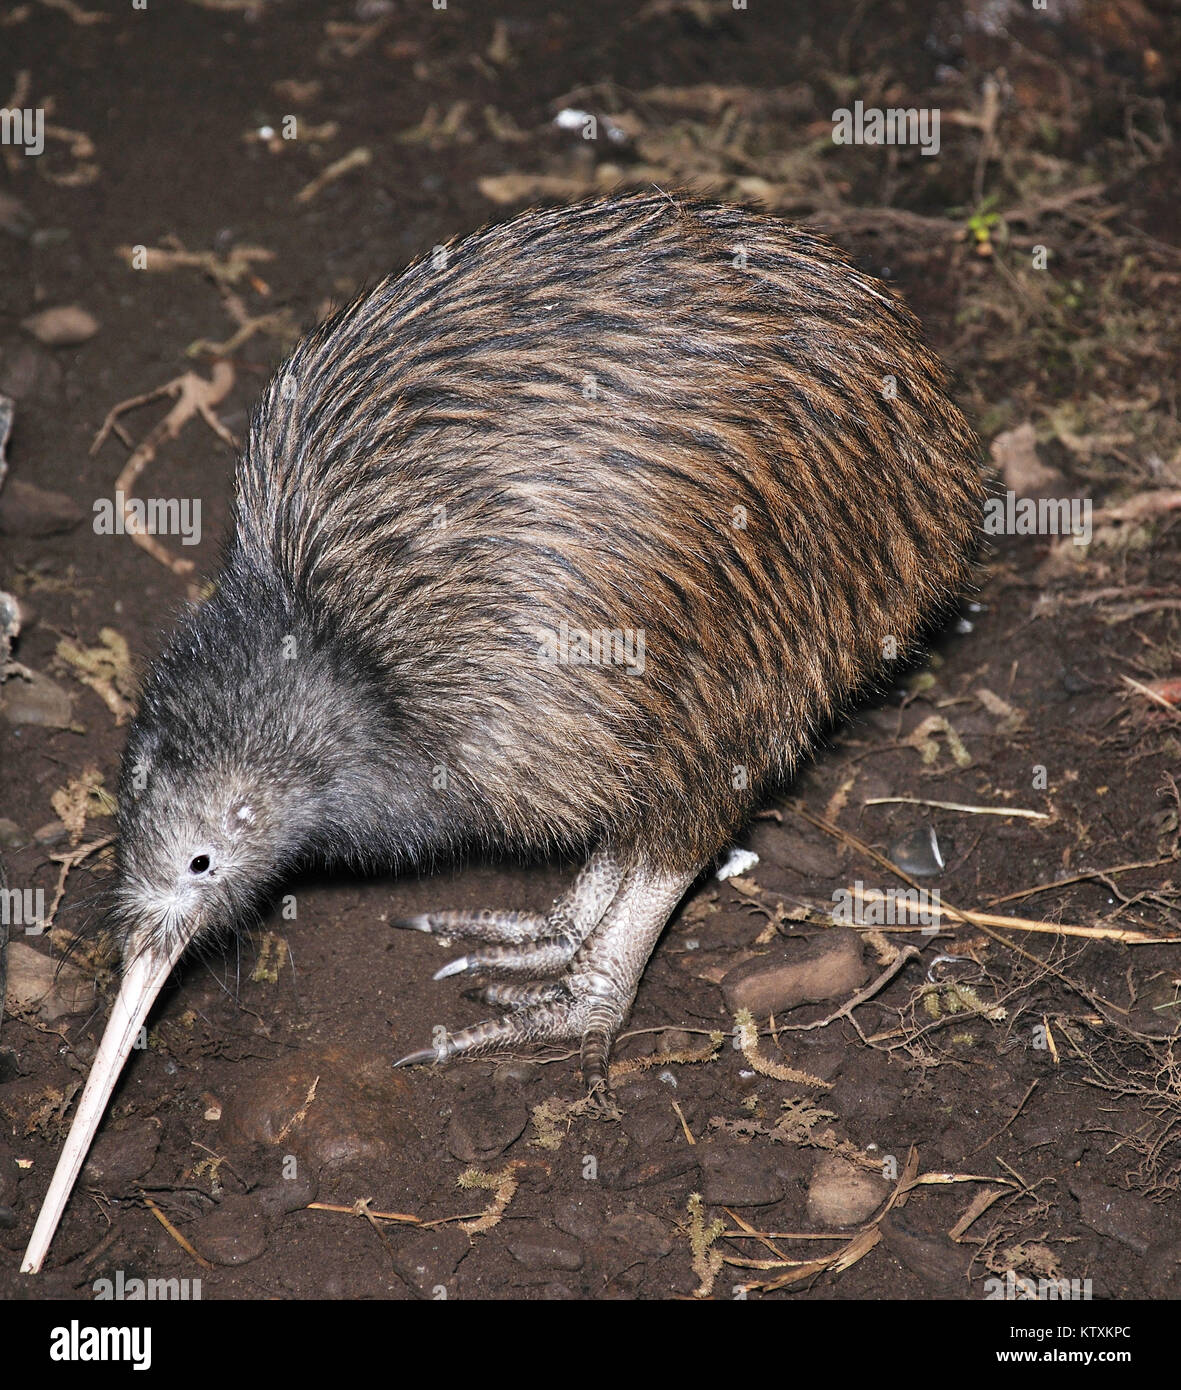 North Island brown kiwi, Apteryx australis, searching for food in New Zealand bush setting - Stock Image